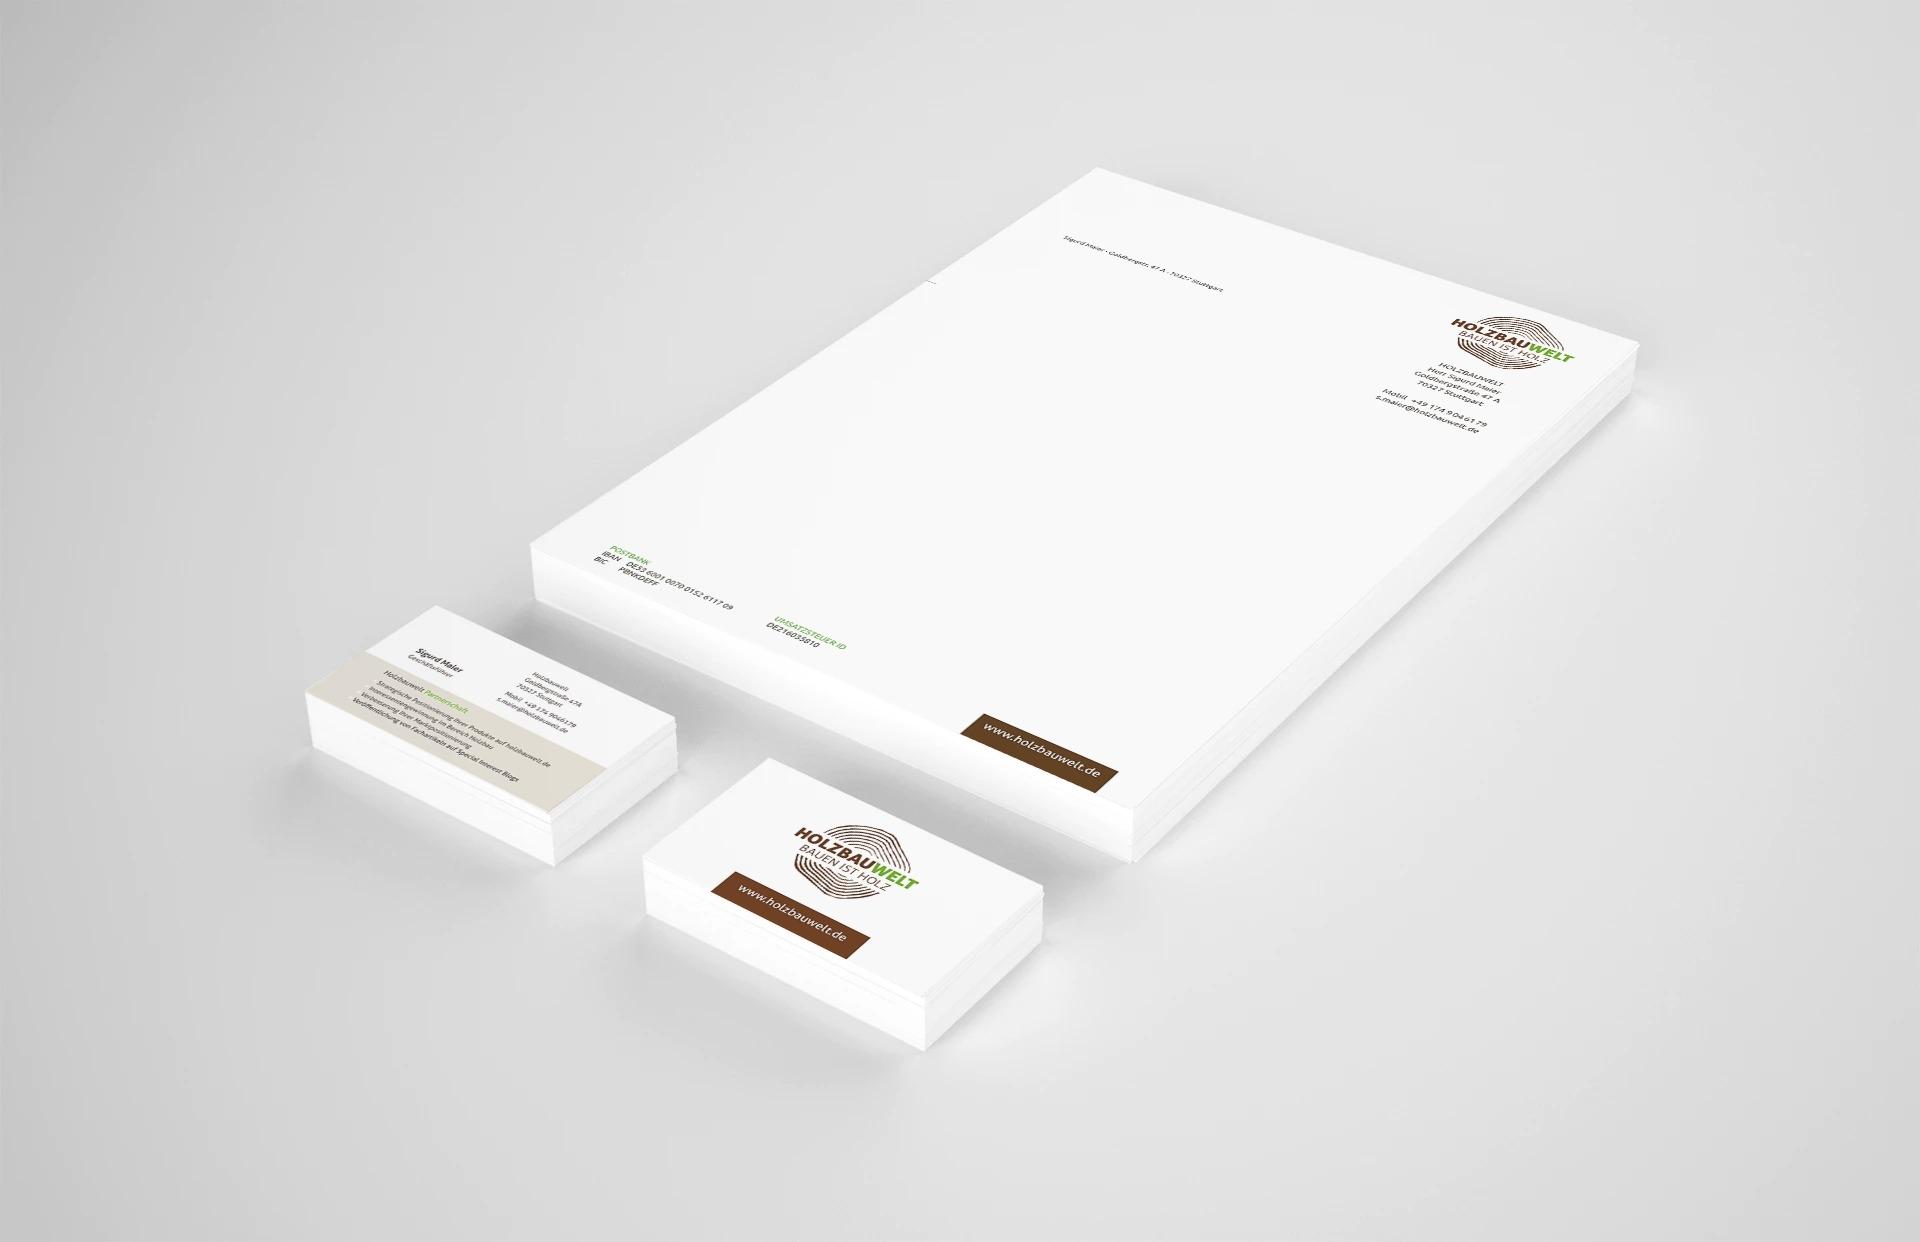 Holzbauwelt.de Briefbogen Visitenkarte